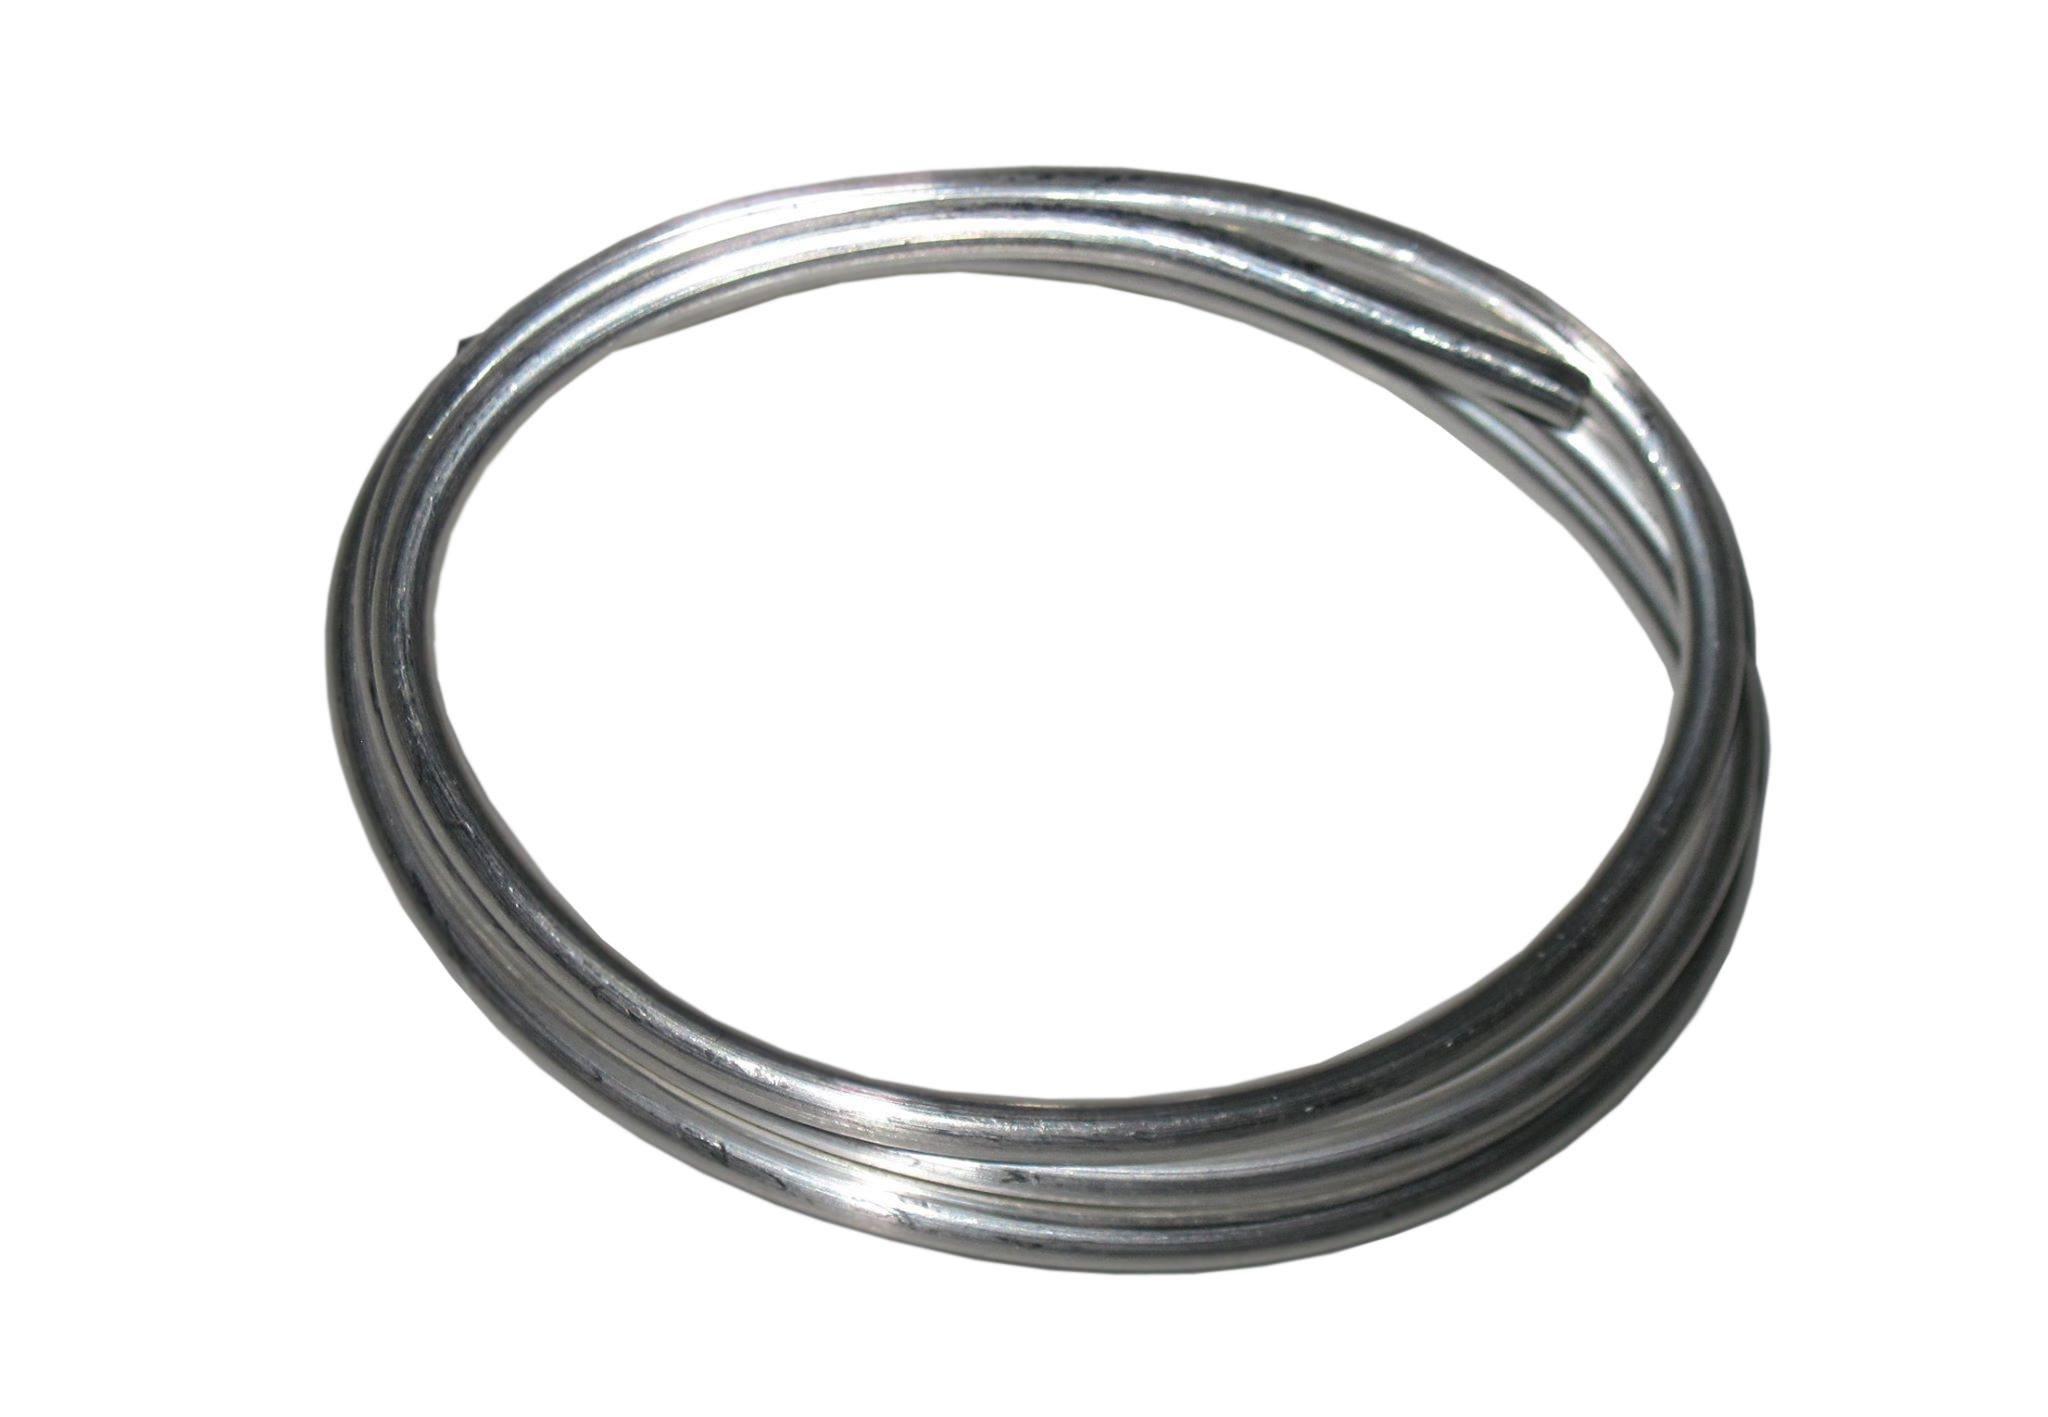 Atlasnova Pure Silver Wire 9999 (Not 999) 10 gauge 1oz 20 Inches by Atlasnova